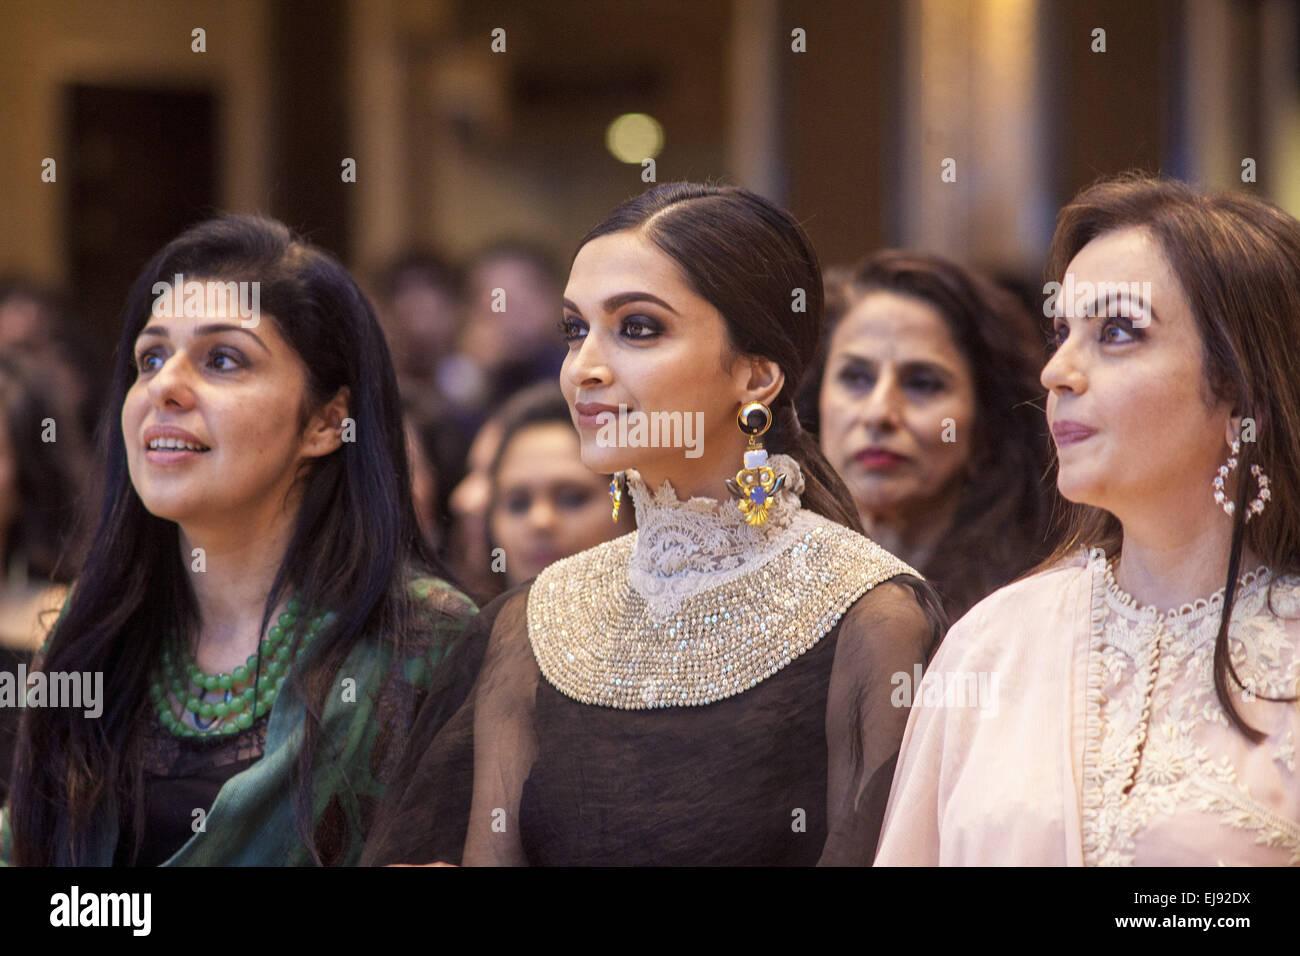 Mumbai, Maharashtra, India. 22nd Mar, 2015. 22 March 2015 : Mumbai - INDIA.Bollywood Actress Deepika Padukone (C), - Stock Image